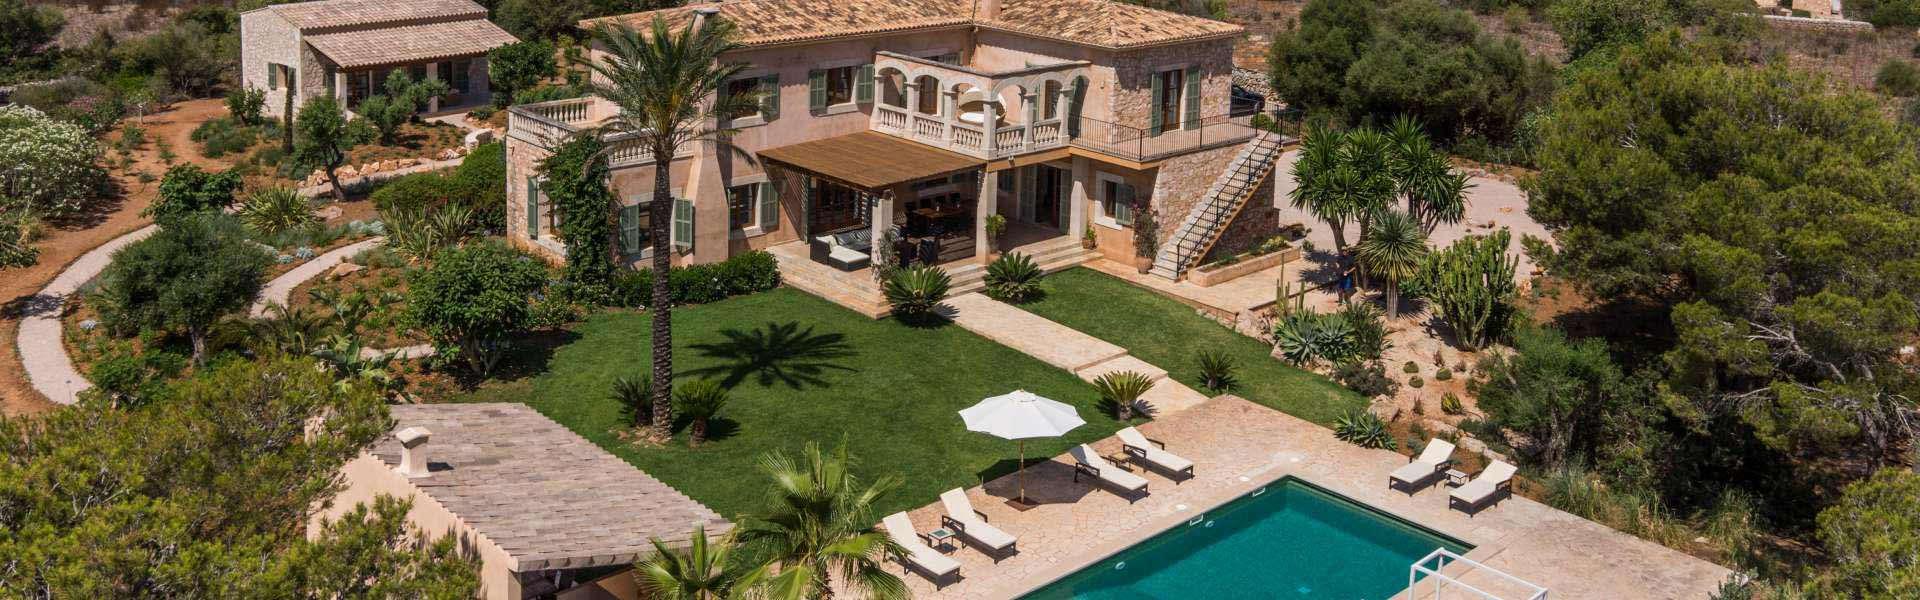 Montemar Immobilien Mallorca - Großes Anwesen auf Mallorca